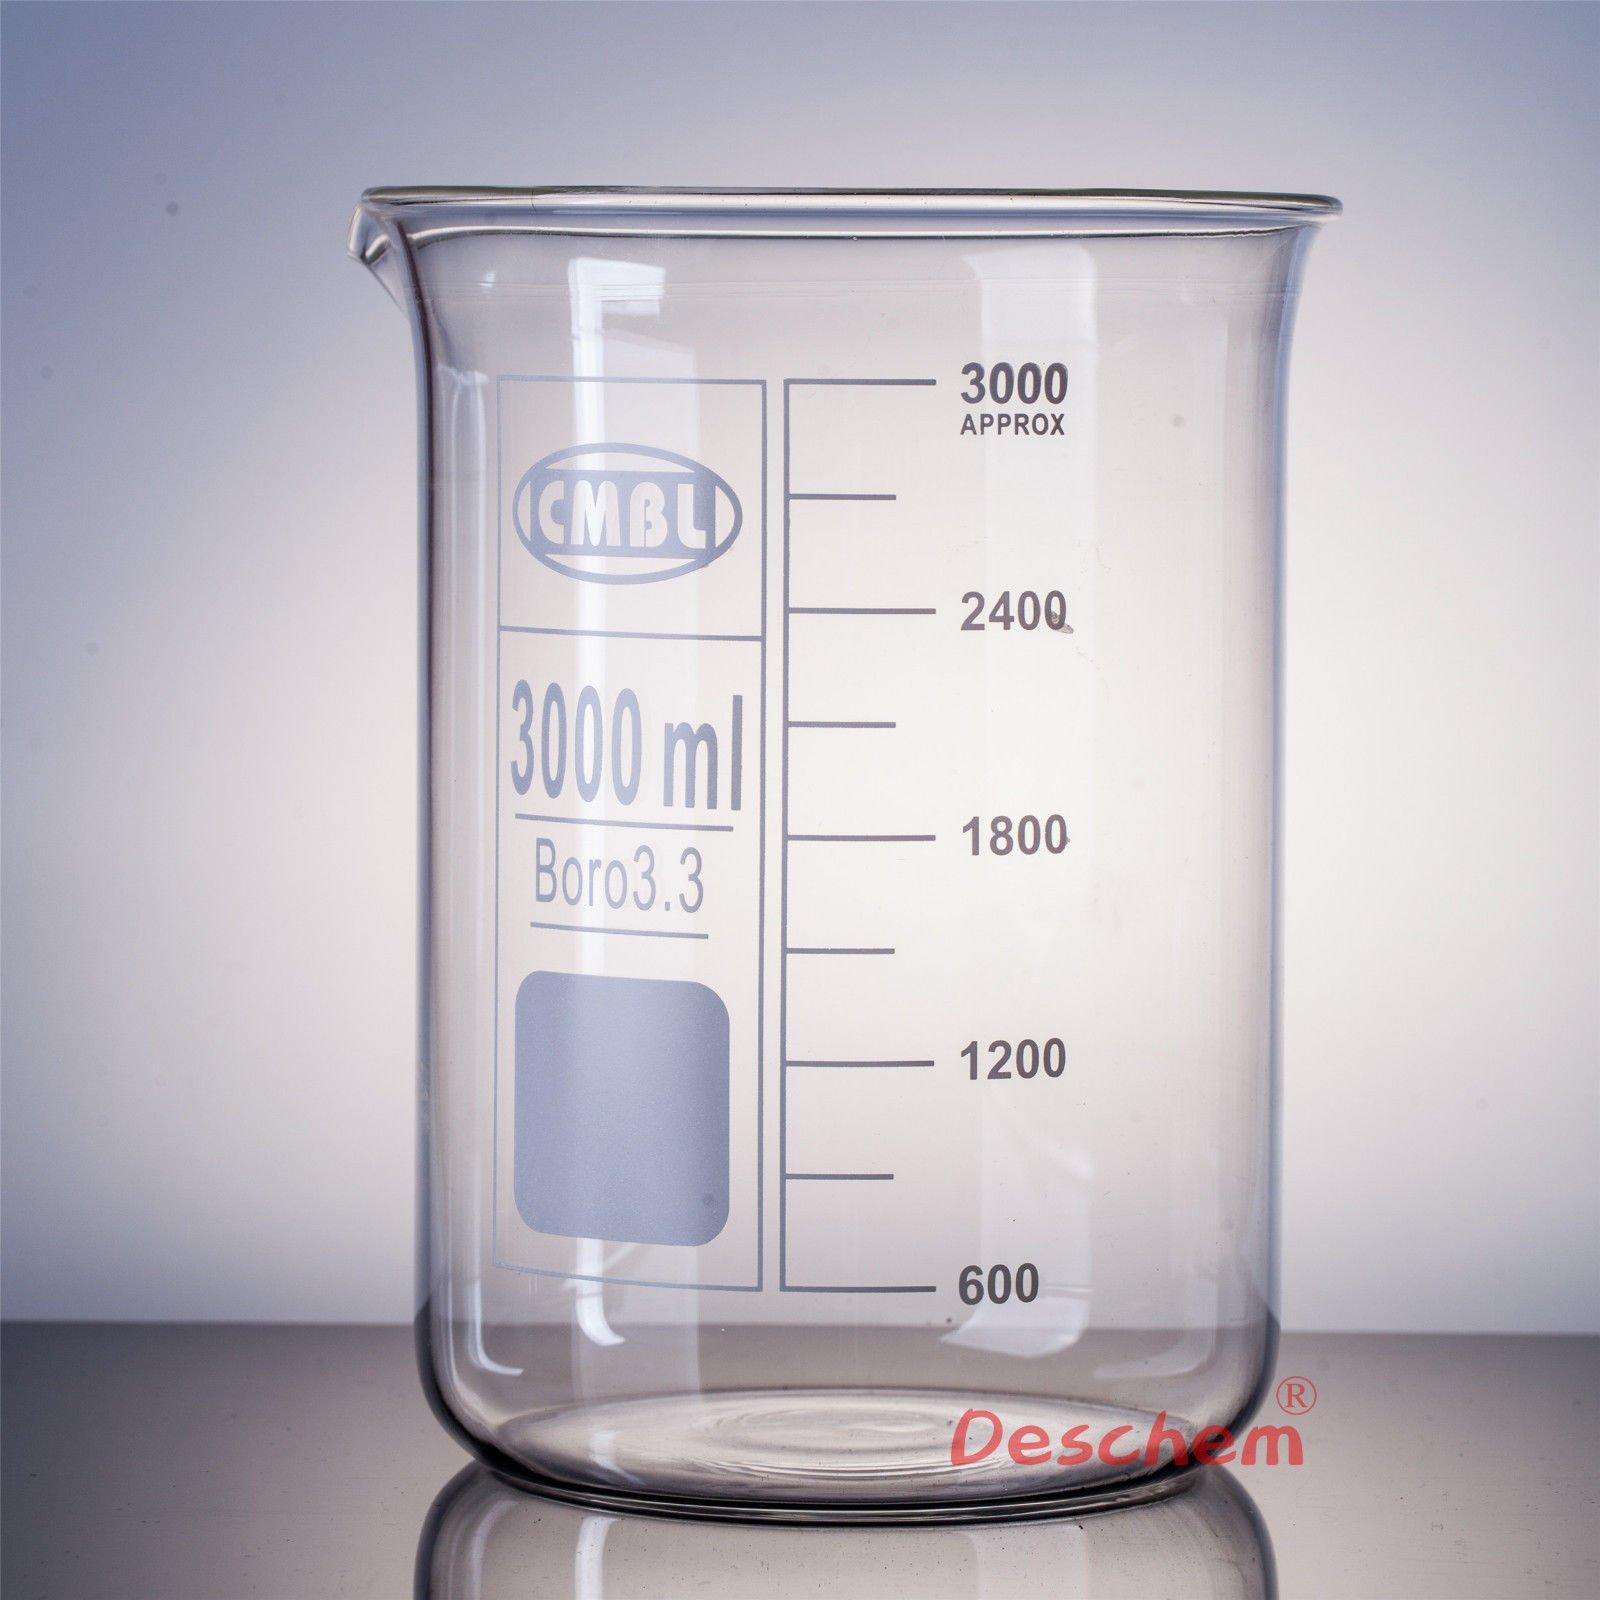 Deschem 3000mL Glass Beaker,3 Litre,Low Form,Good Quality,Lab Borosilicate Glassware by Deschem